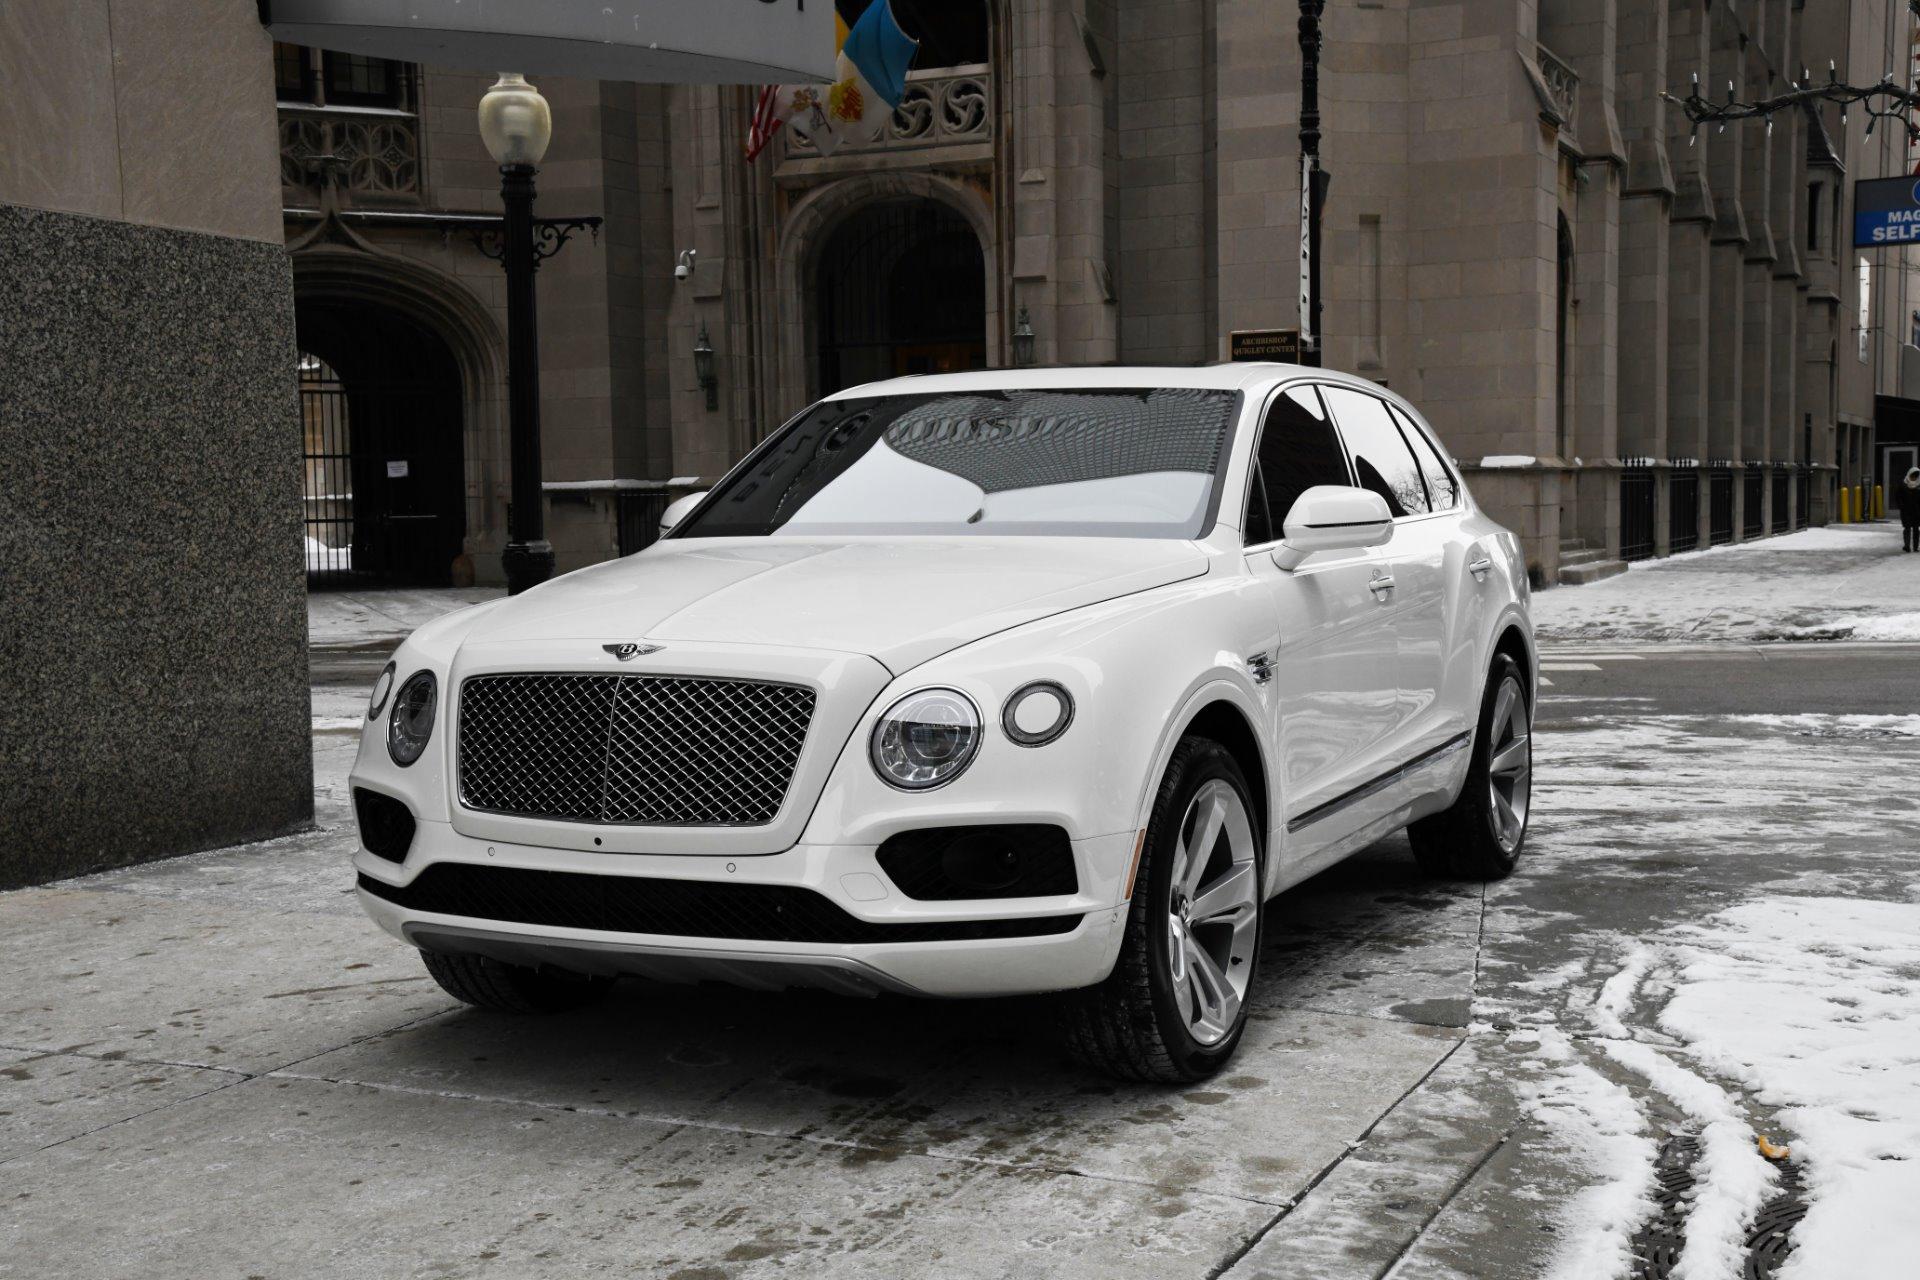 2018 Bentley Bentayga Onyx Edition Stock C17521 For Sale Near Chicago Il Il Bentley Dealer